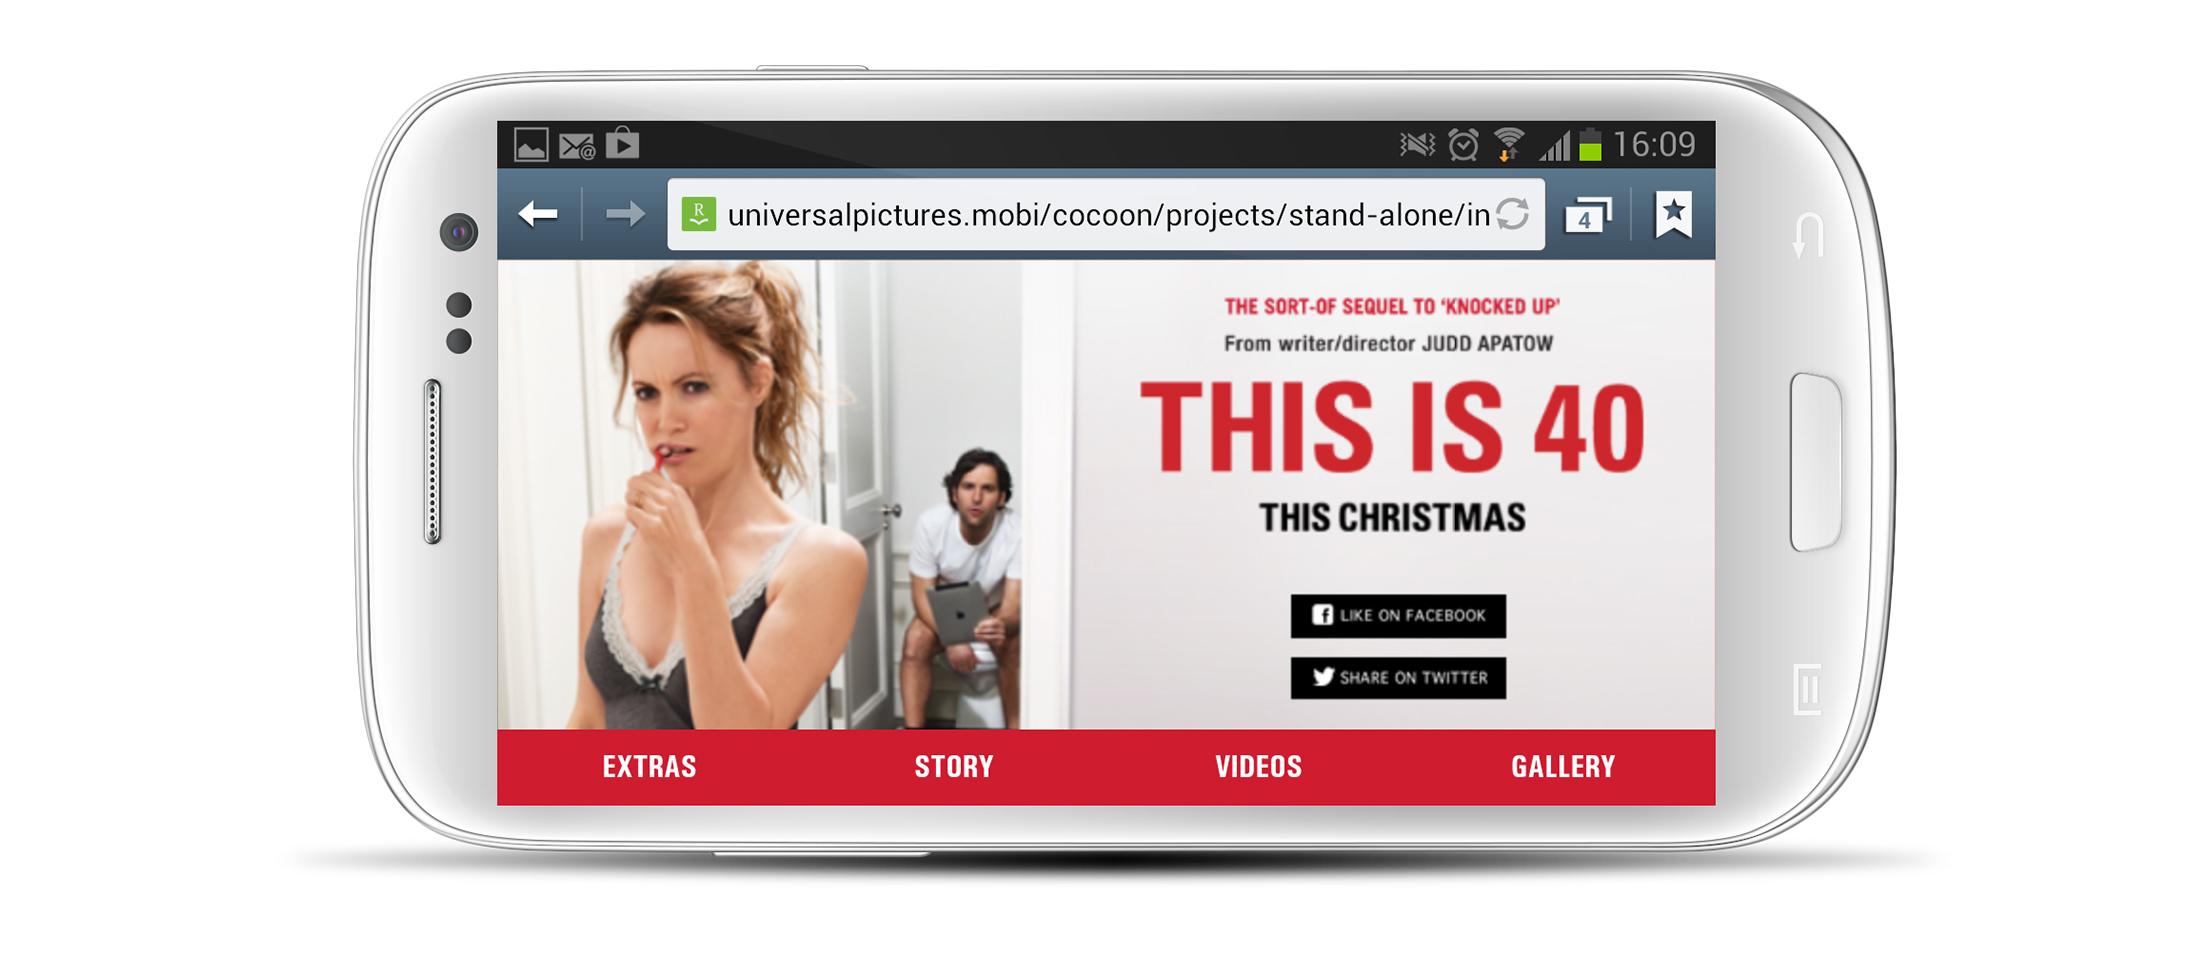 Smartphone: homescreen in landscape orientation.